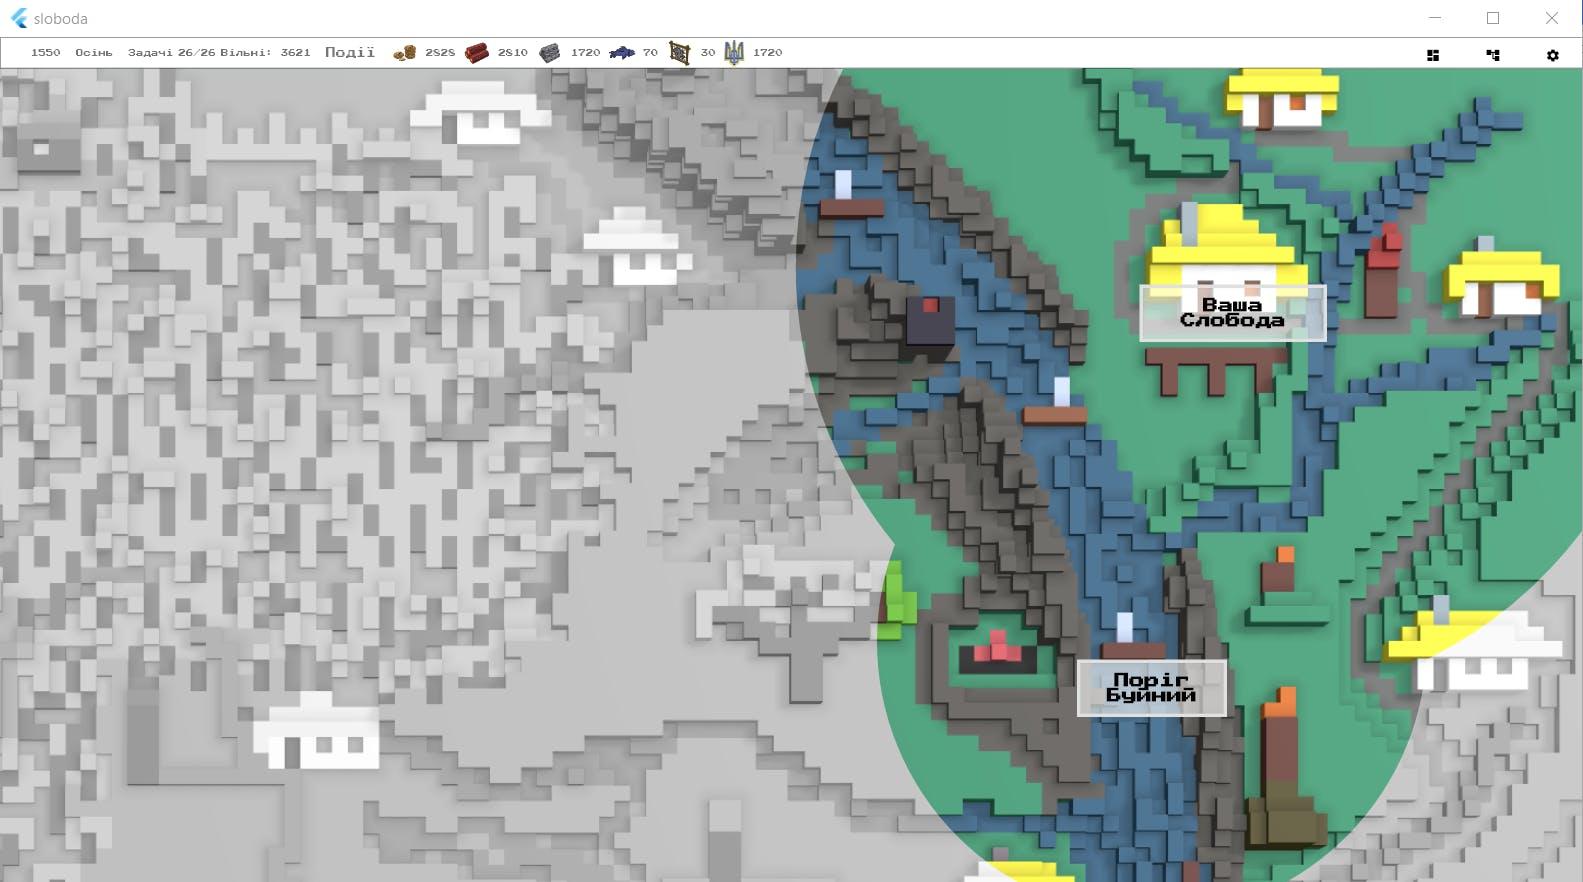 Screenshot 2020-12-01 231504.png